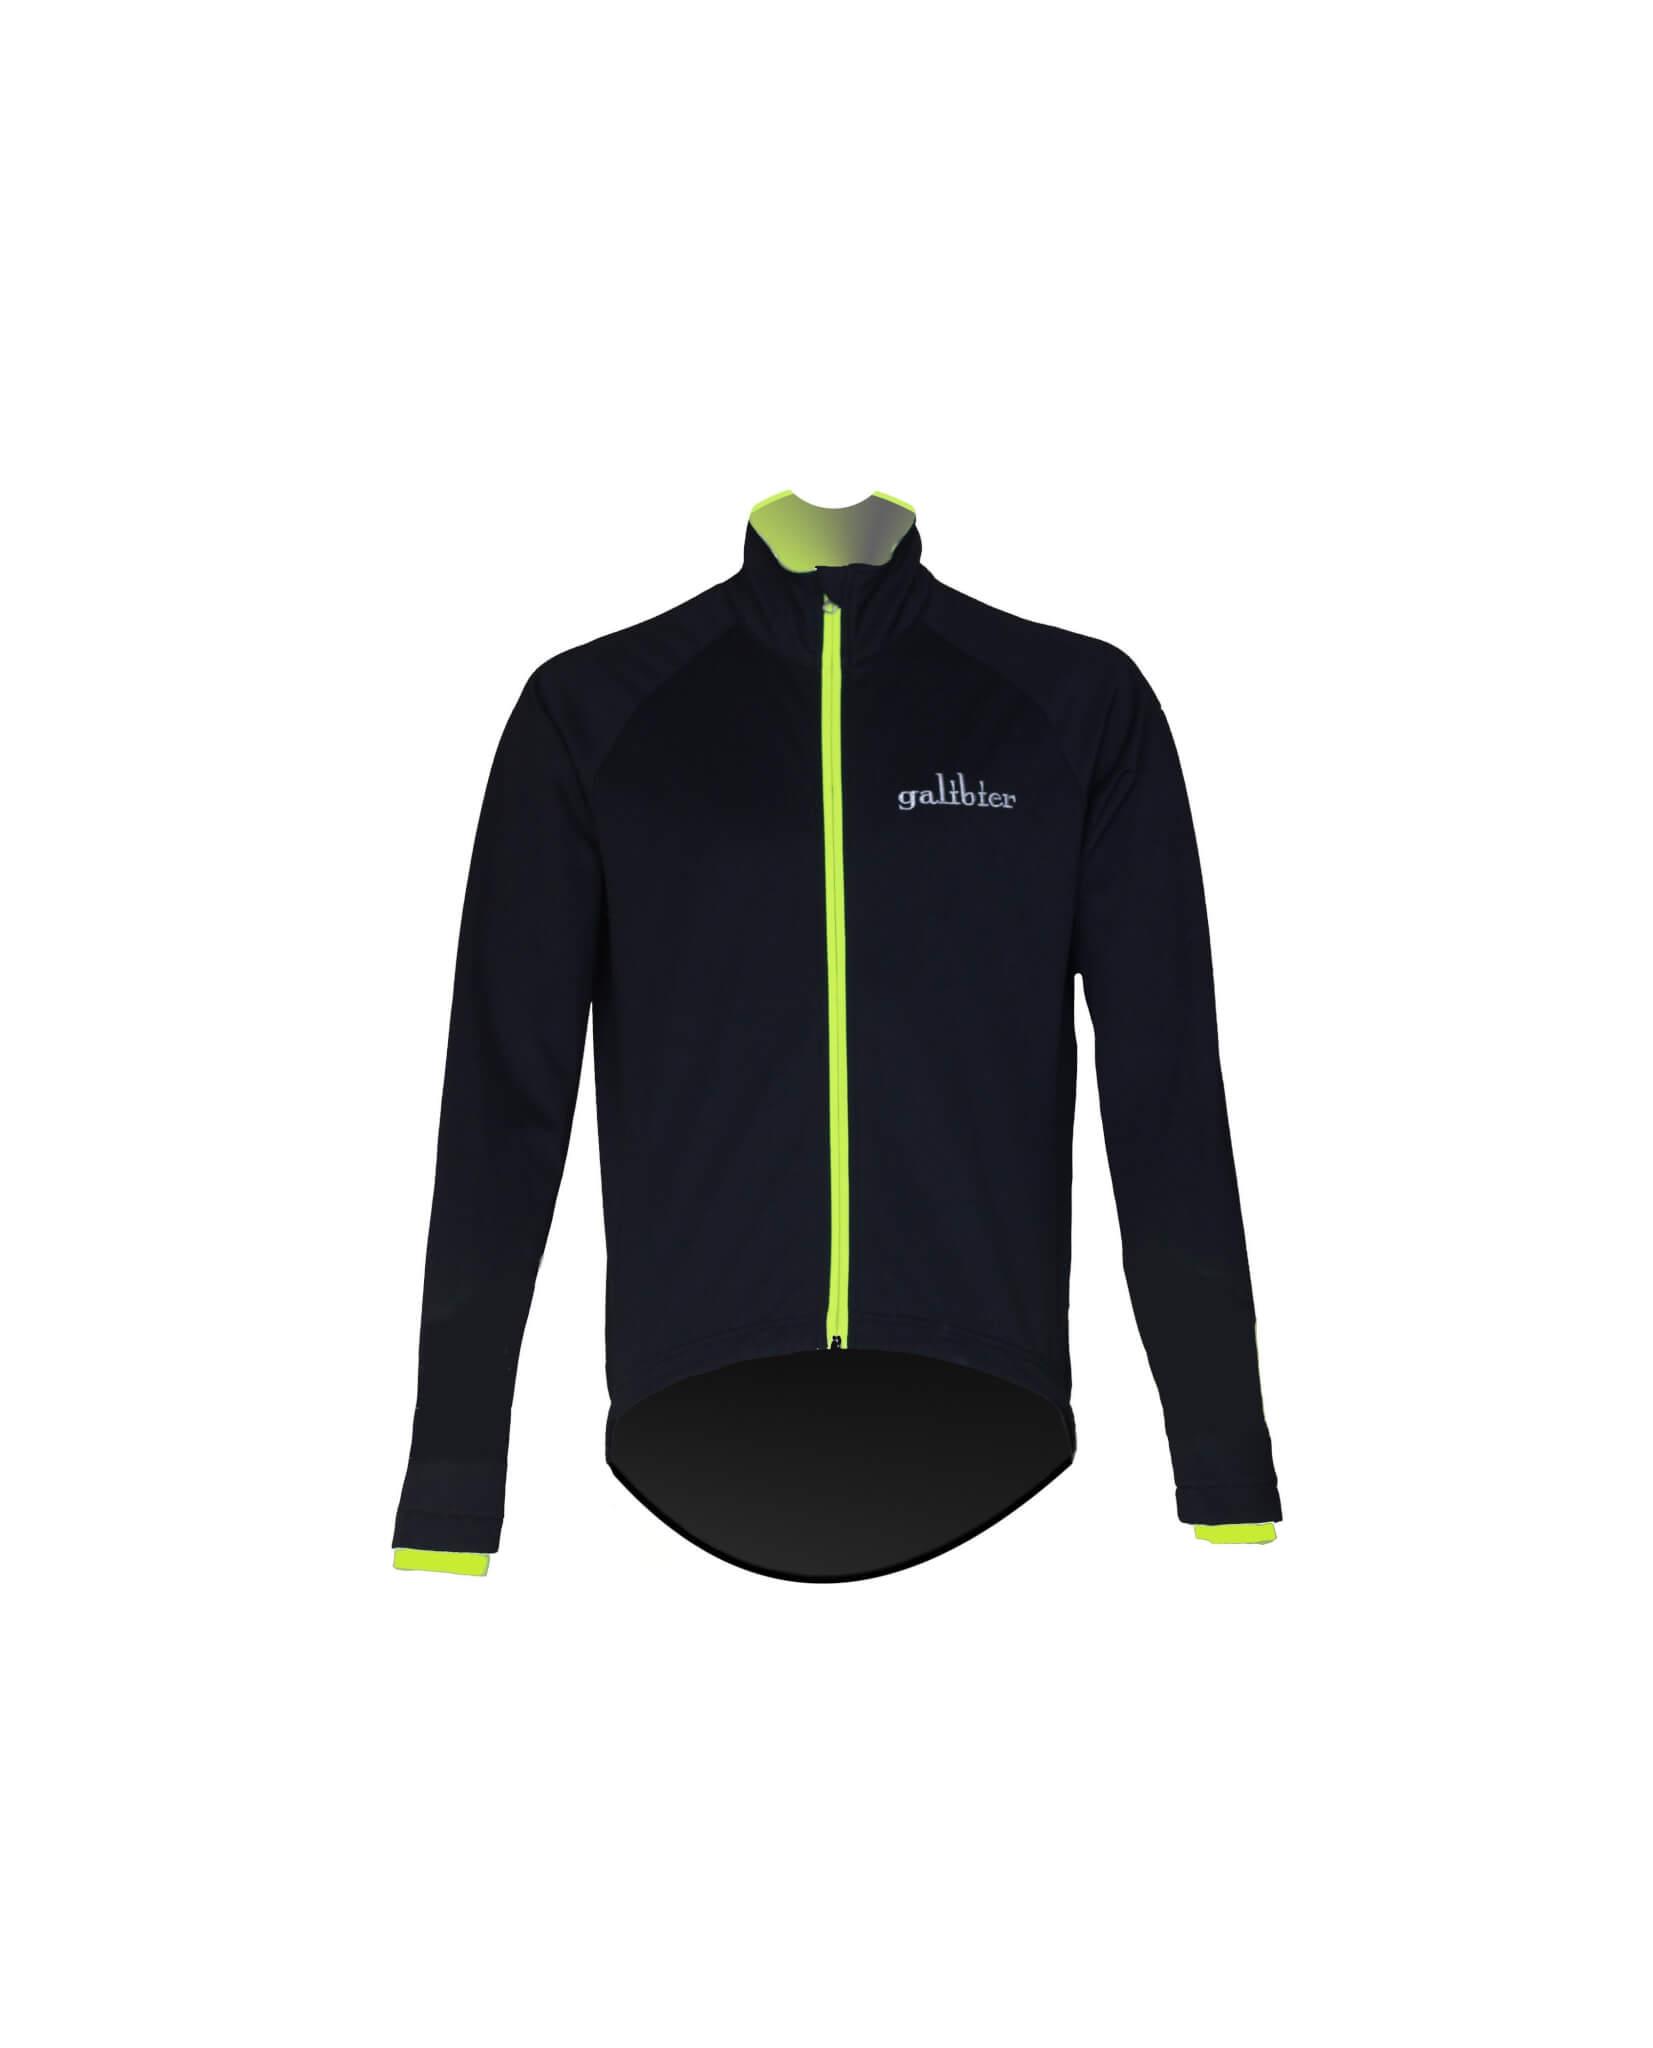 742ae5240 Mistral foul weather Jacket